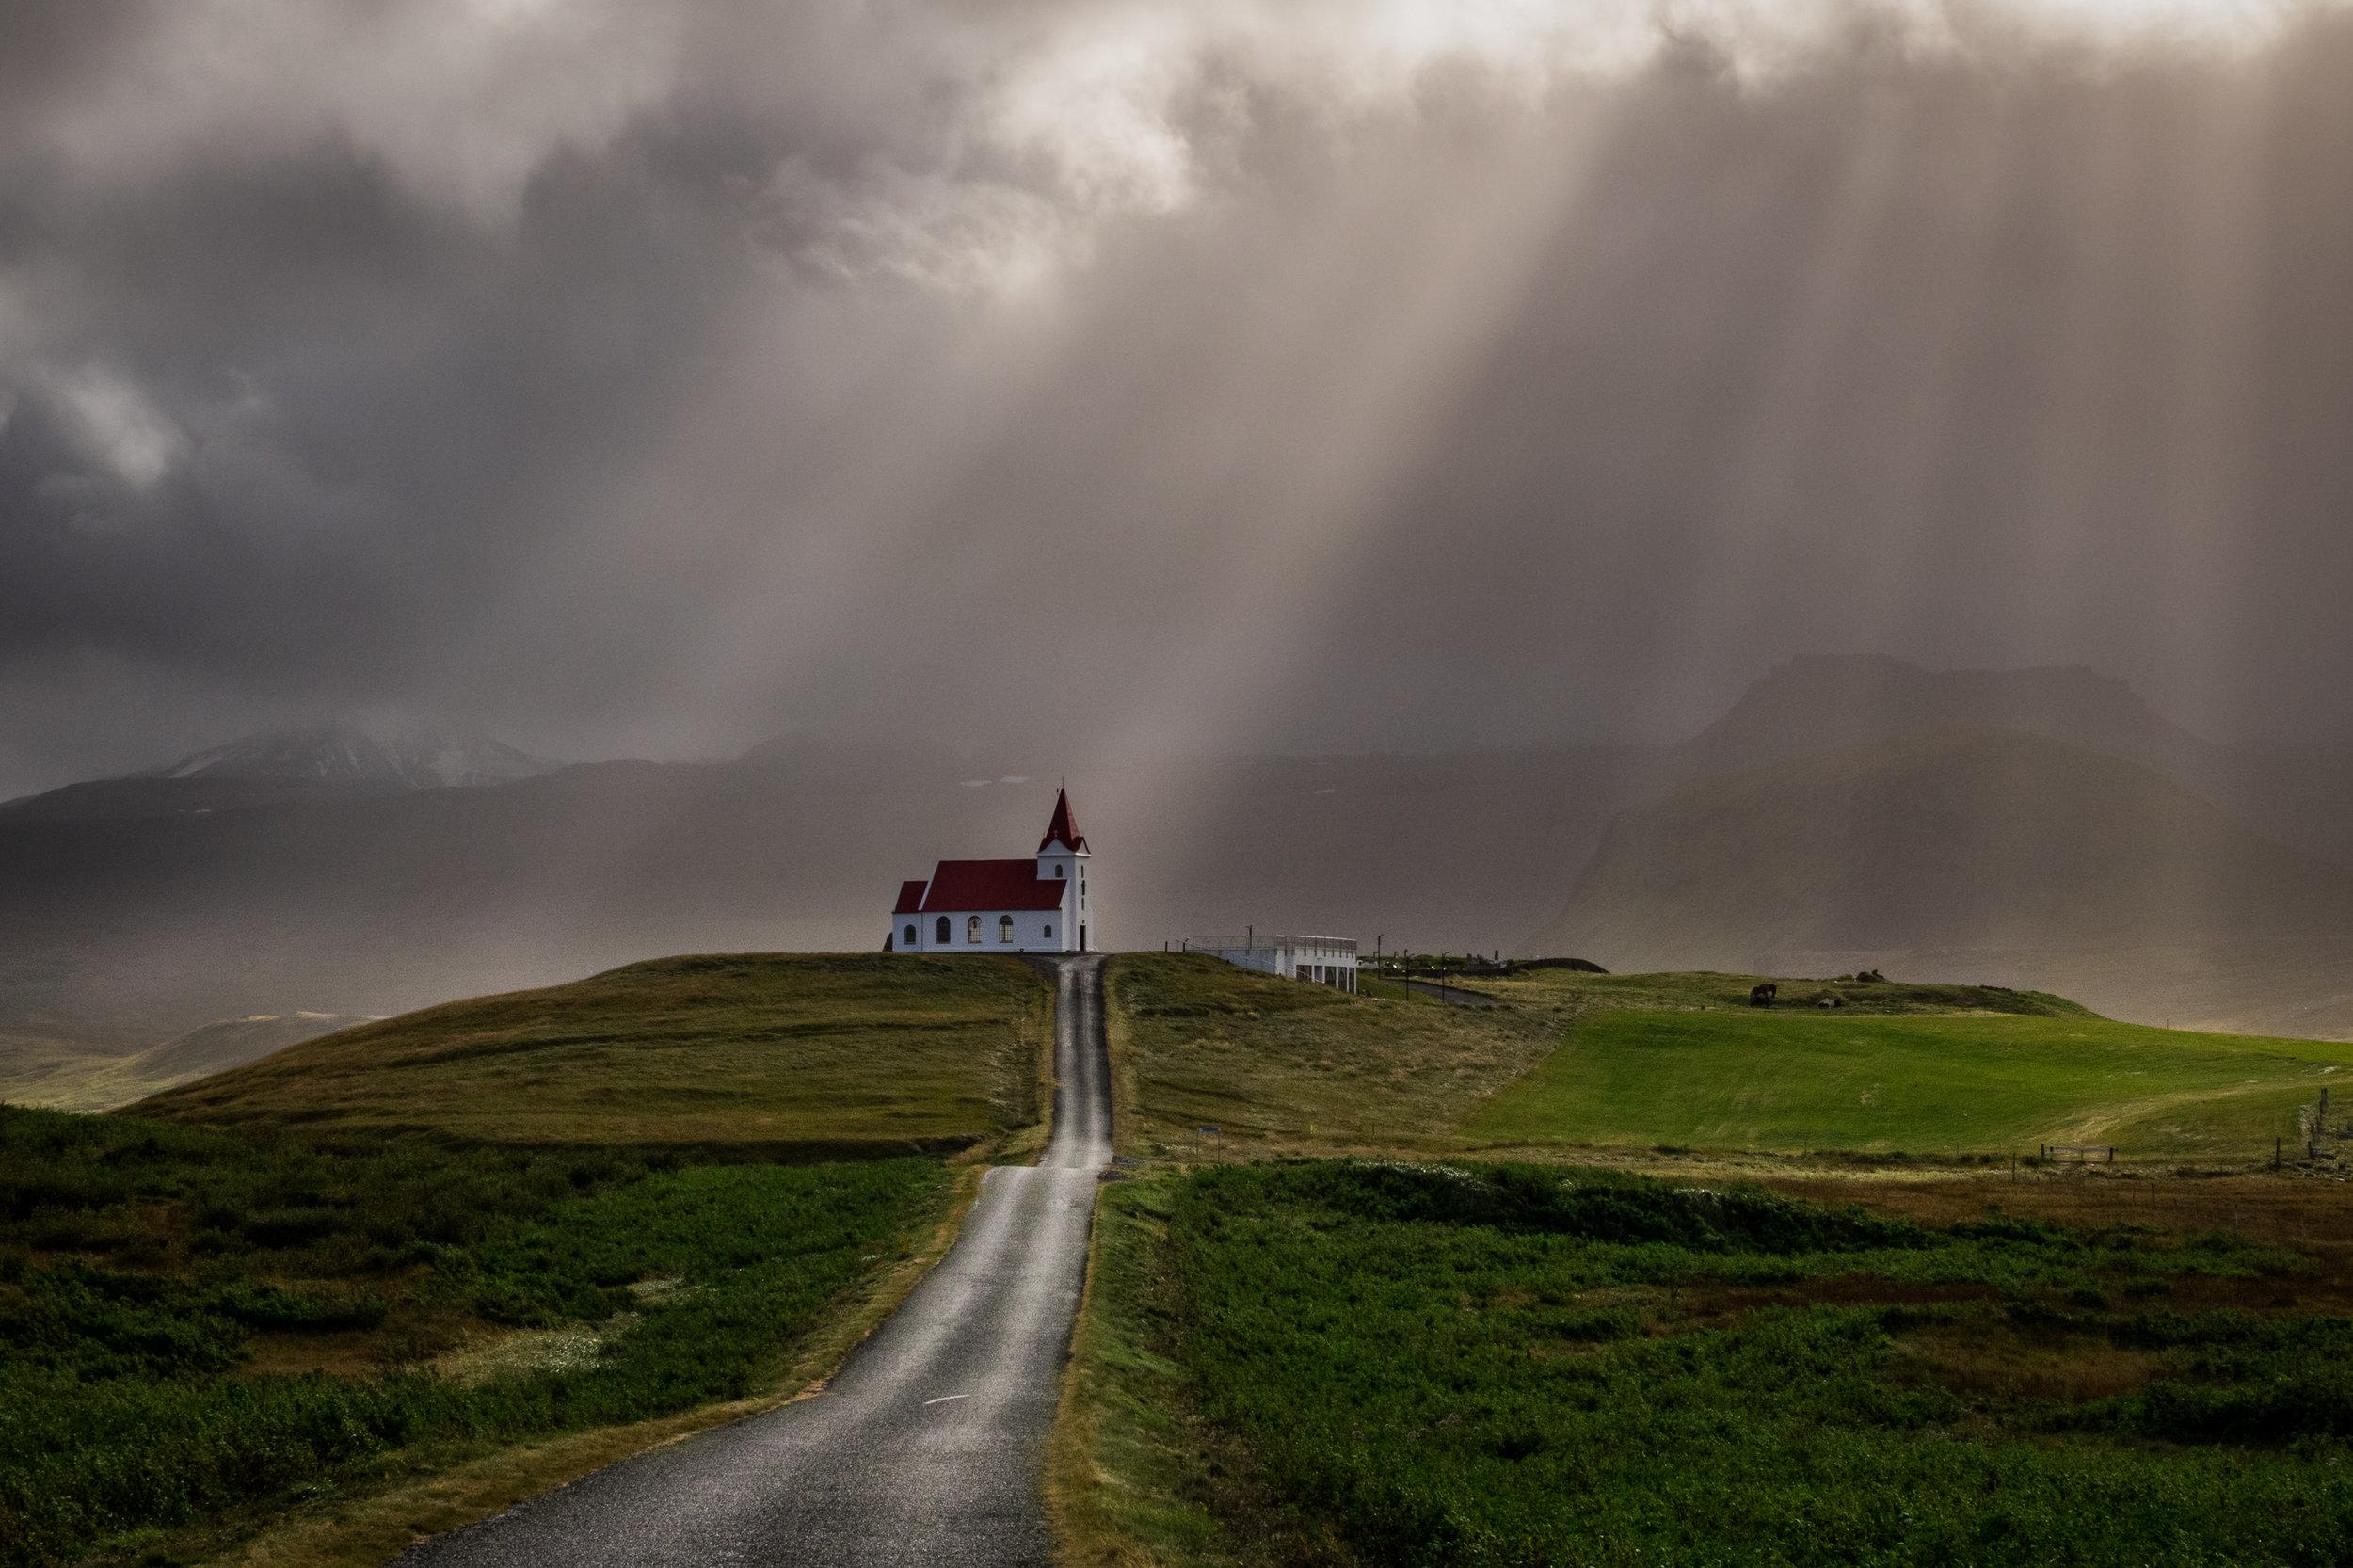 2018-09-14 RX104 Iceland_20180924_sonyrx10m4_DSC01179.jpg